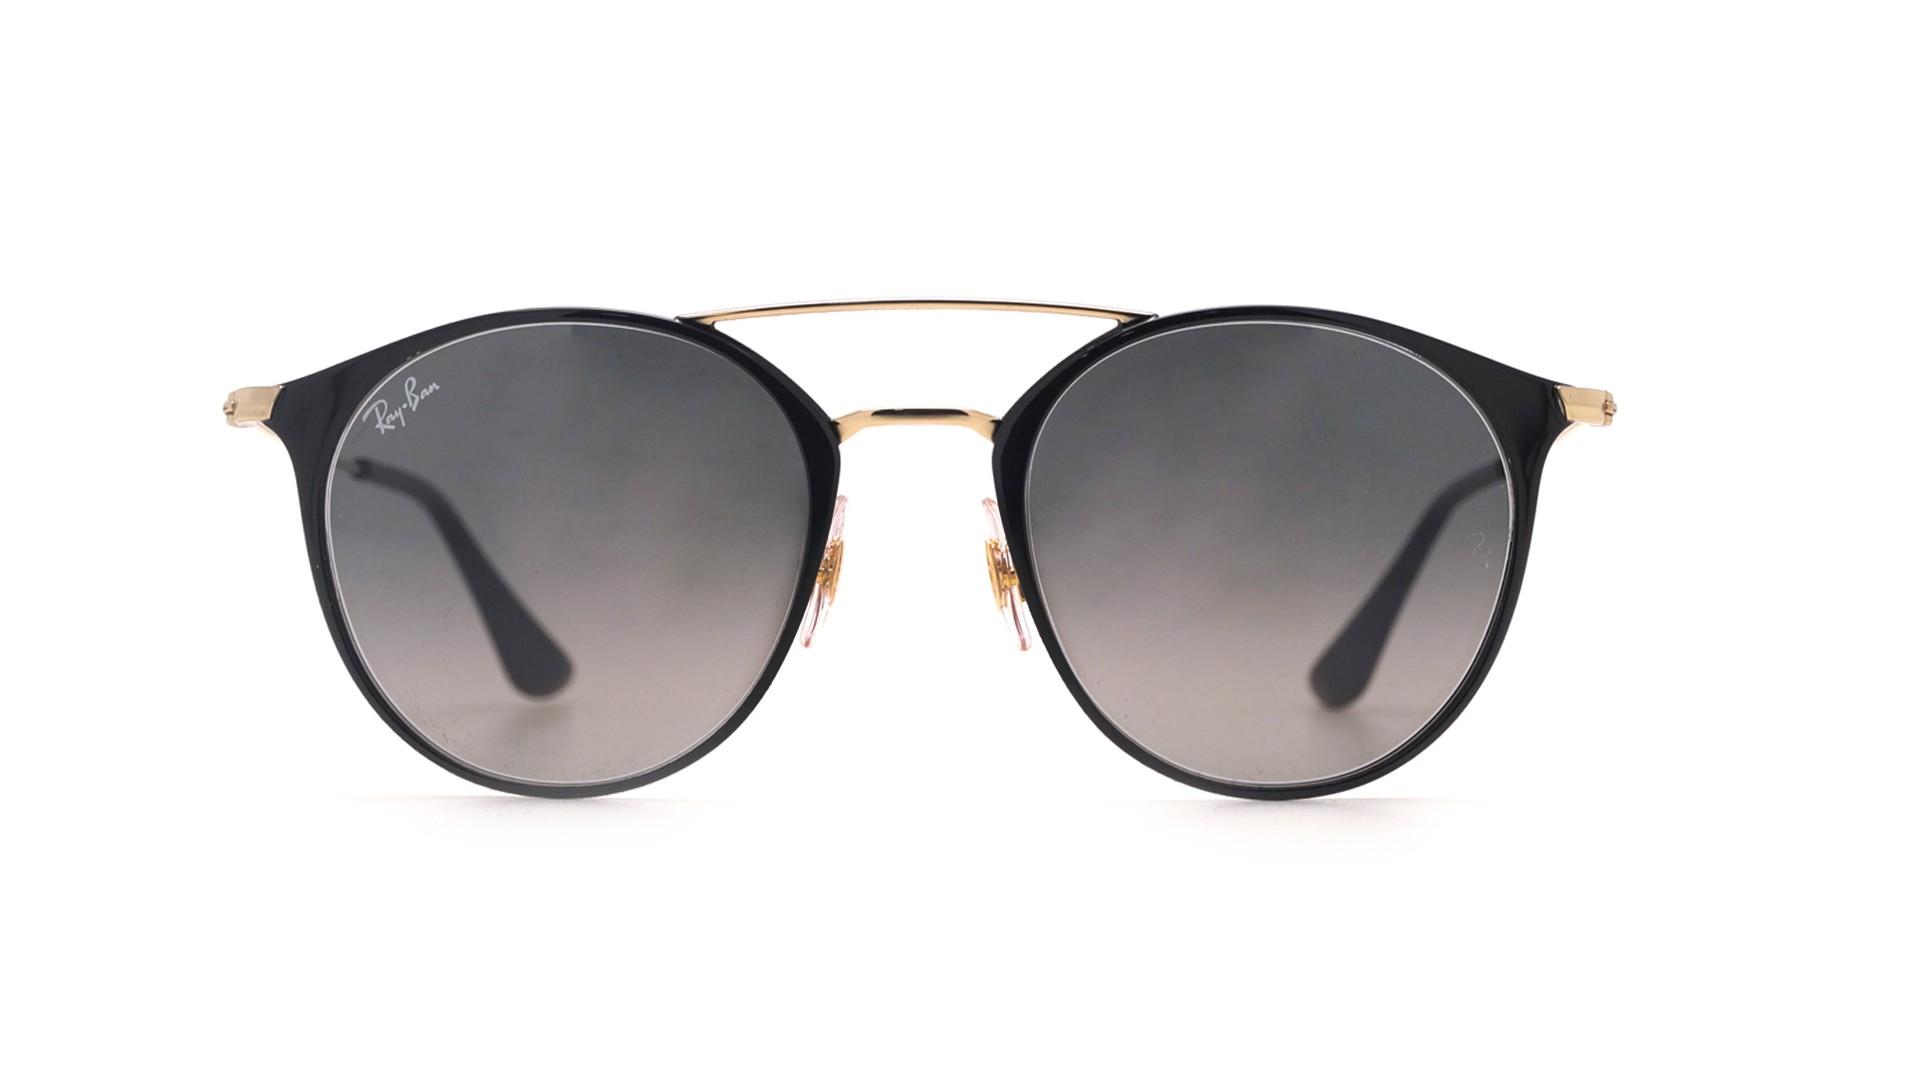 Sunglasses Ray-Ban RB3546 187 71 49-20 Black Small Gradient 575f7422f25